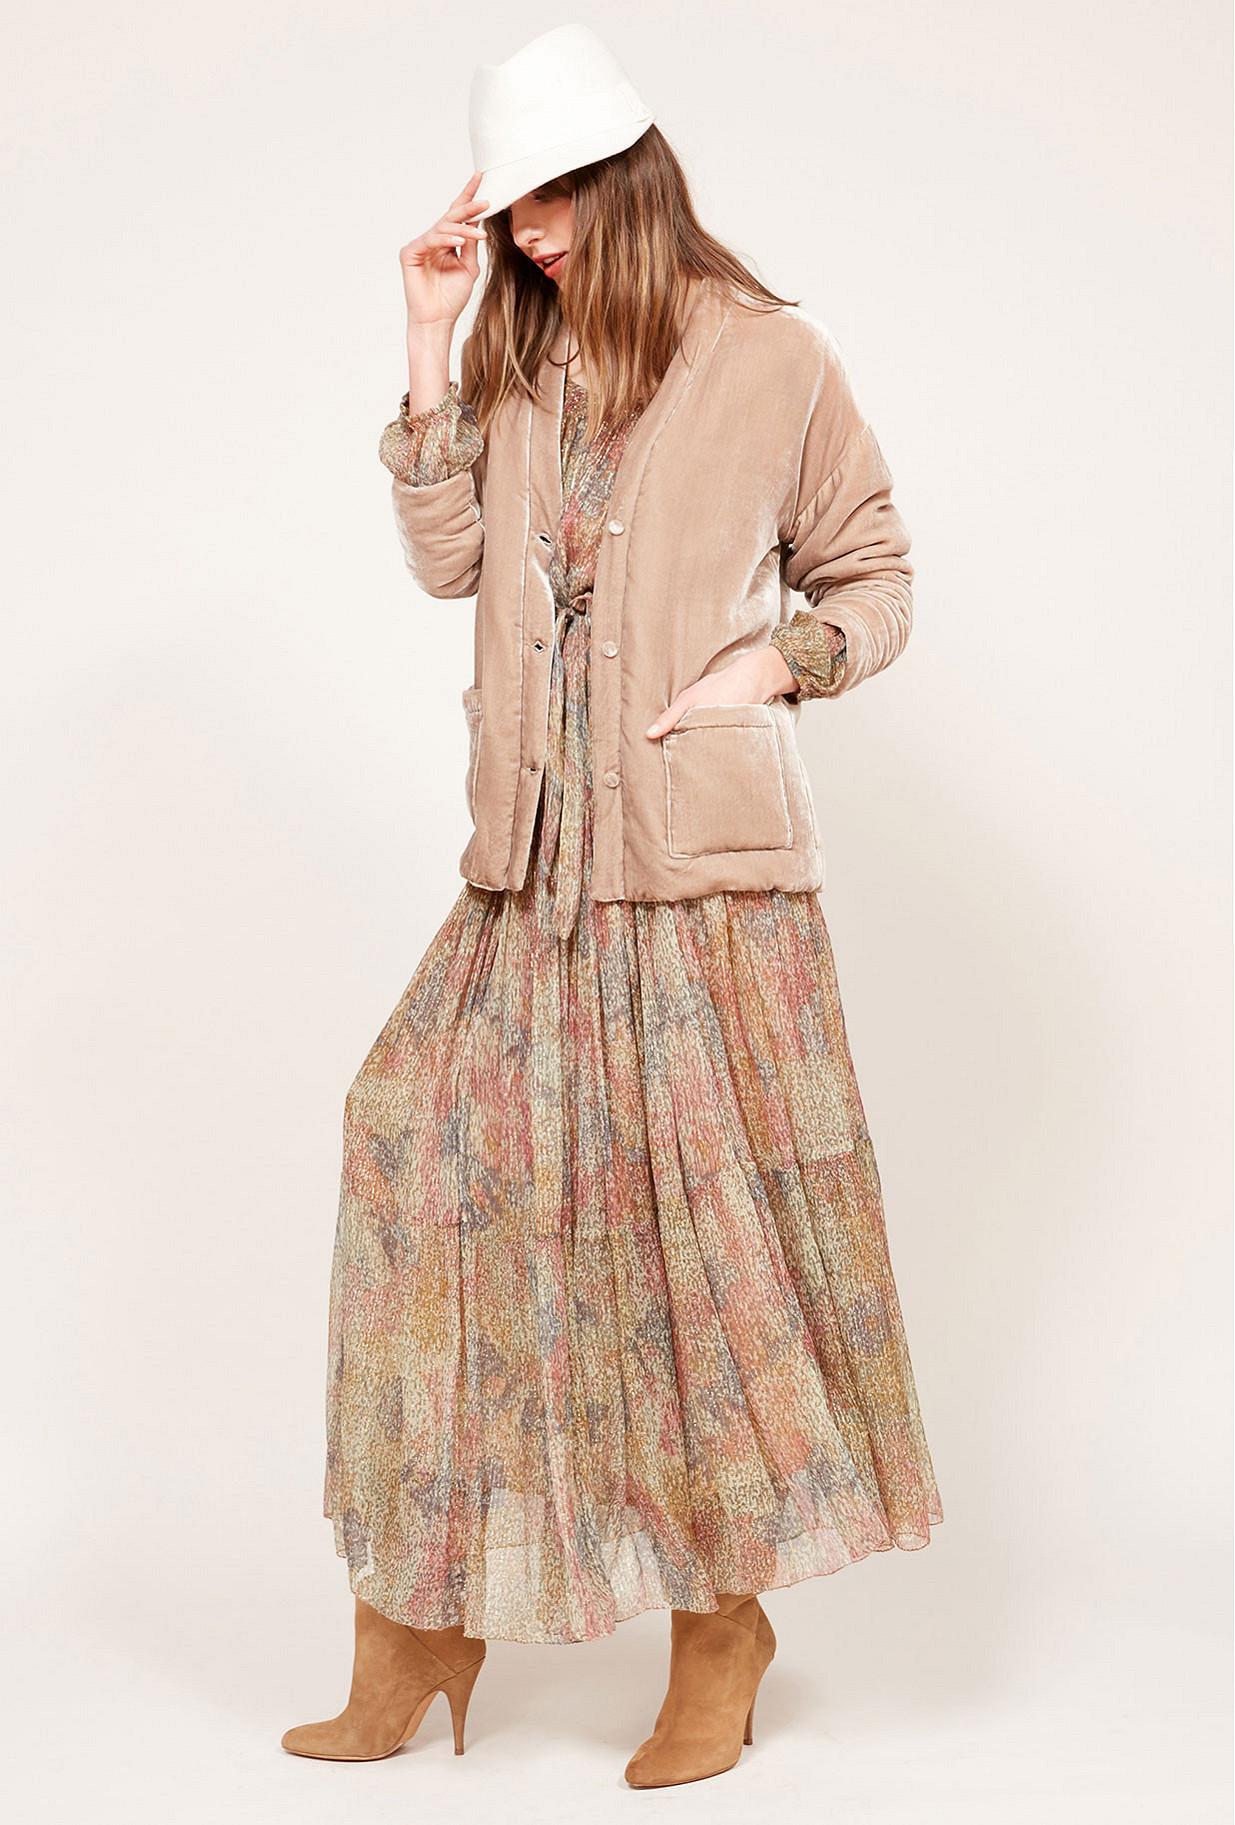 Grey  Jacket  Sucker Mes demoiselles fashion clothes designer Paris